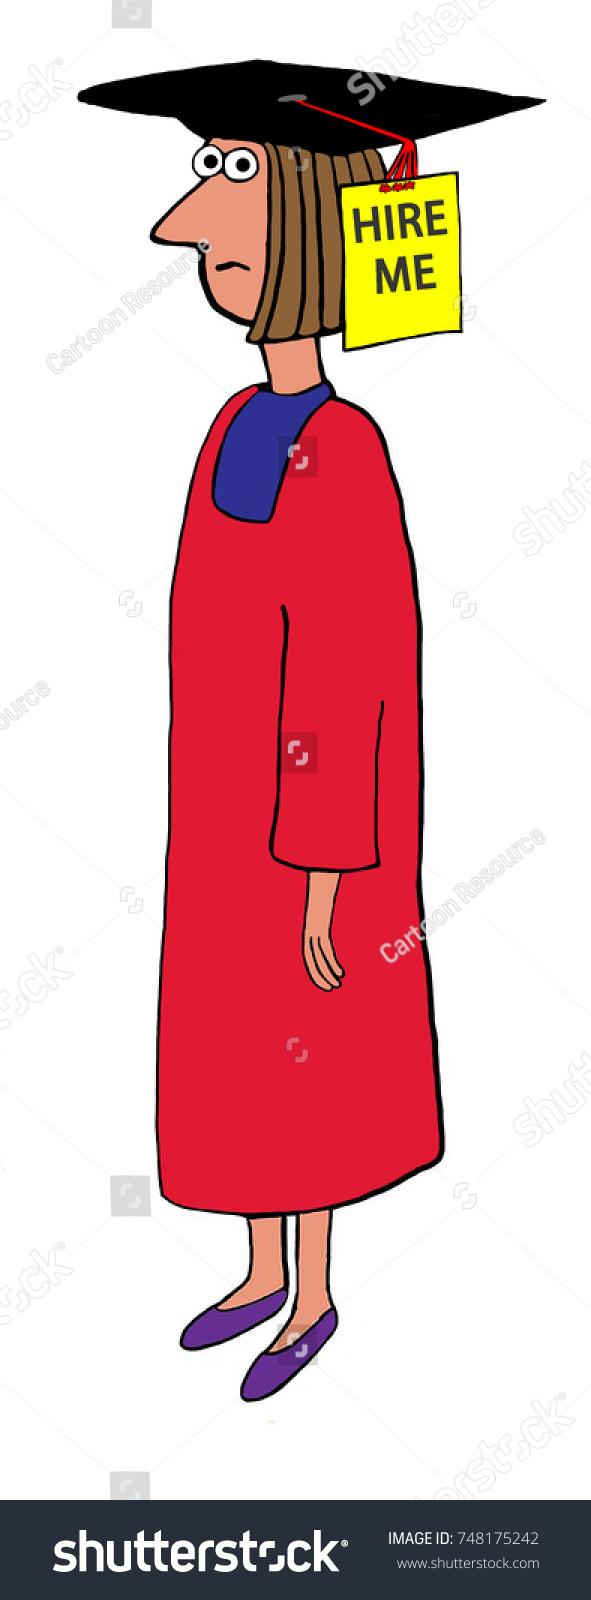 Education Cartoon Illustration Female Graduate Wearing Stock ...